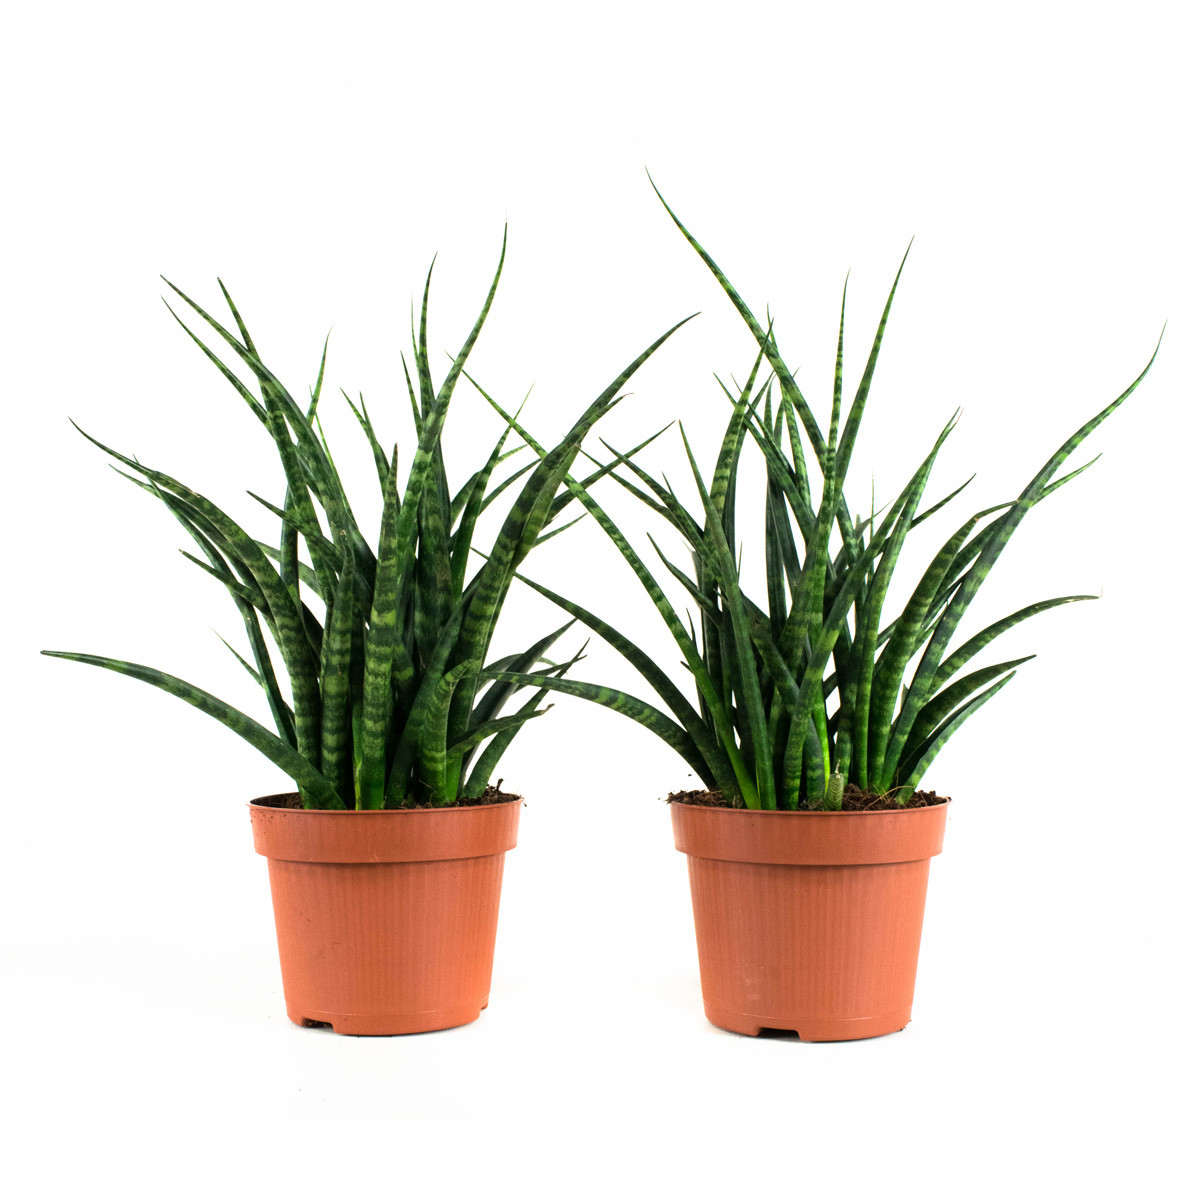 Sanseveria Fernwood Punky25 cm